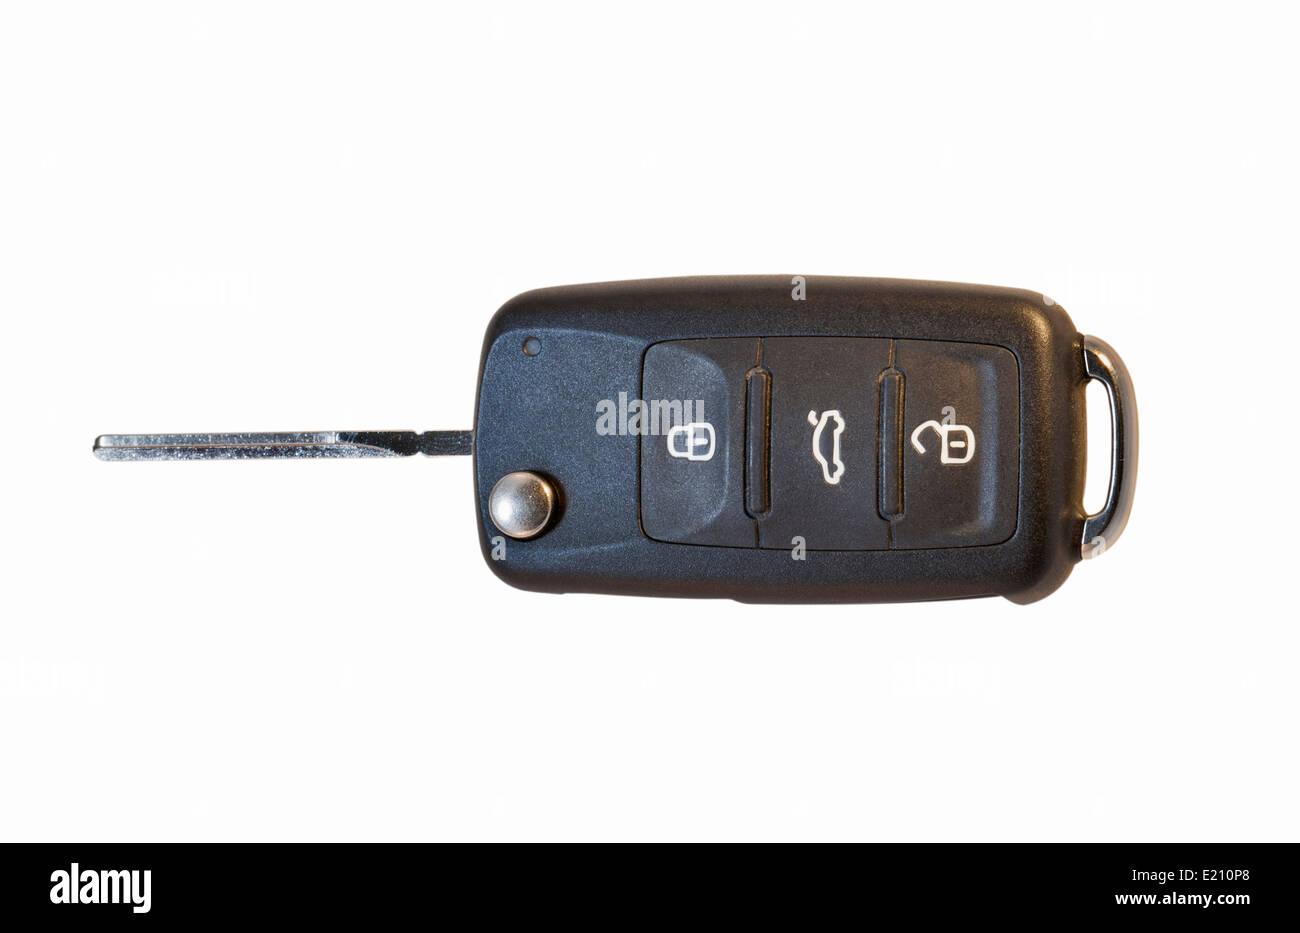 Modern Car Key isolated against White Background - Stock Image